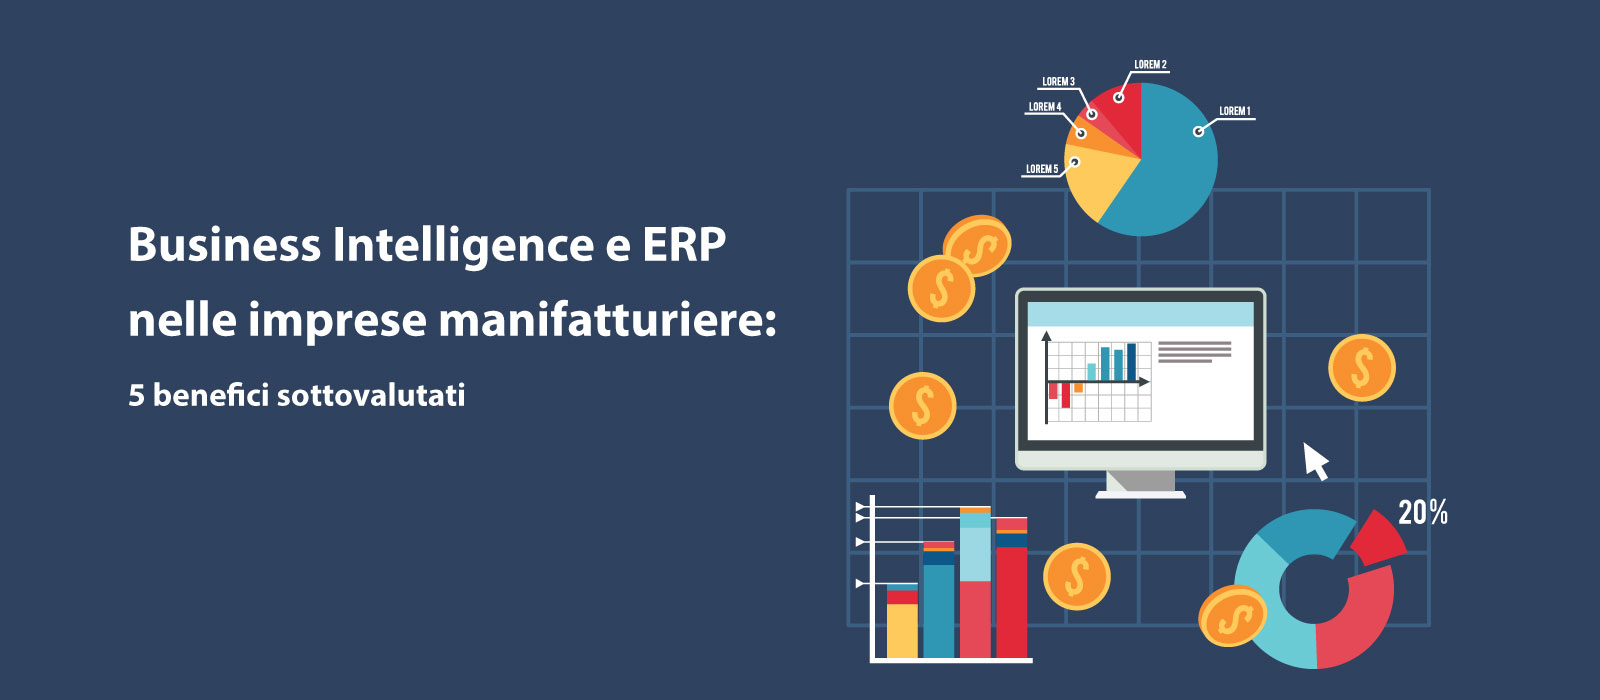 business intelligence e erp: 5 vantaggi